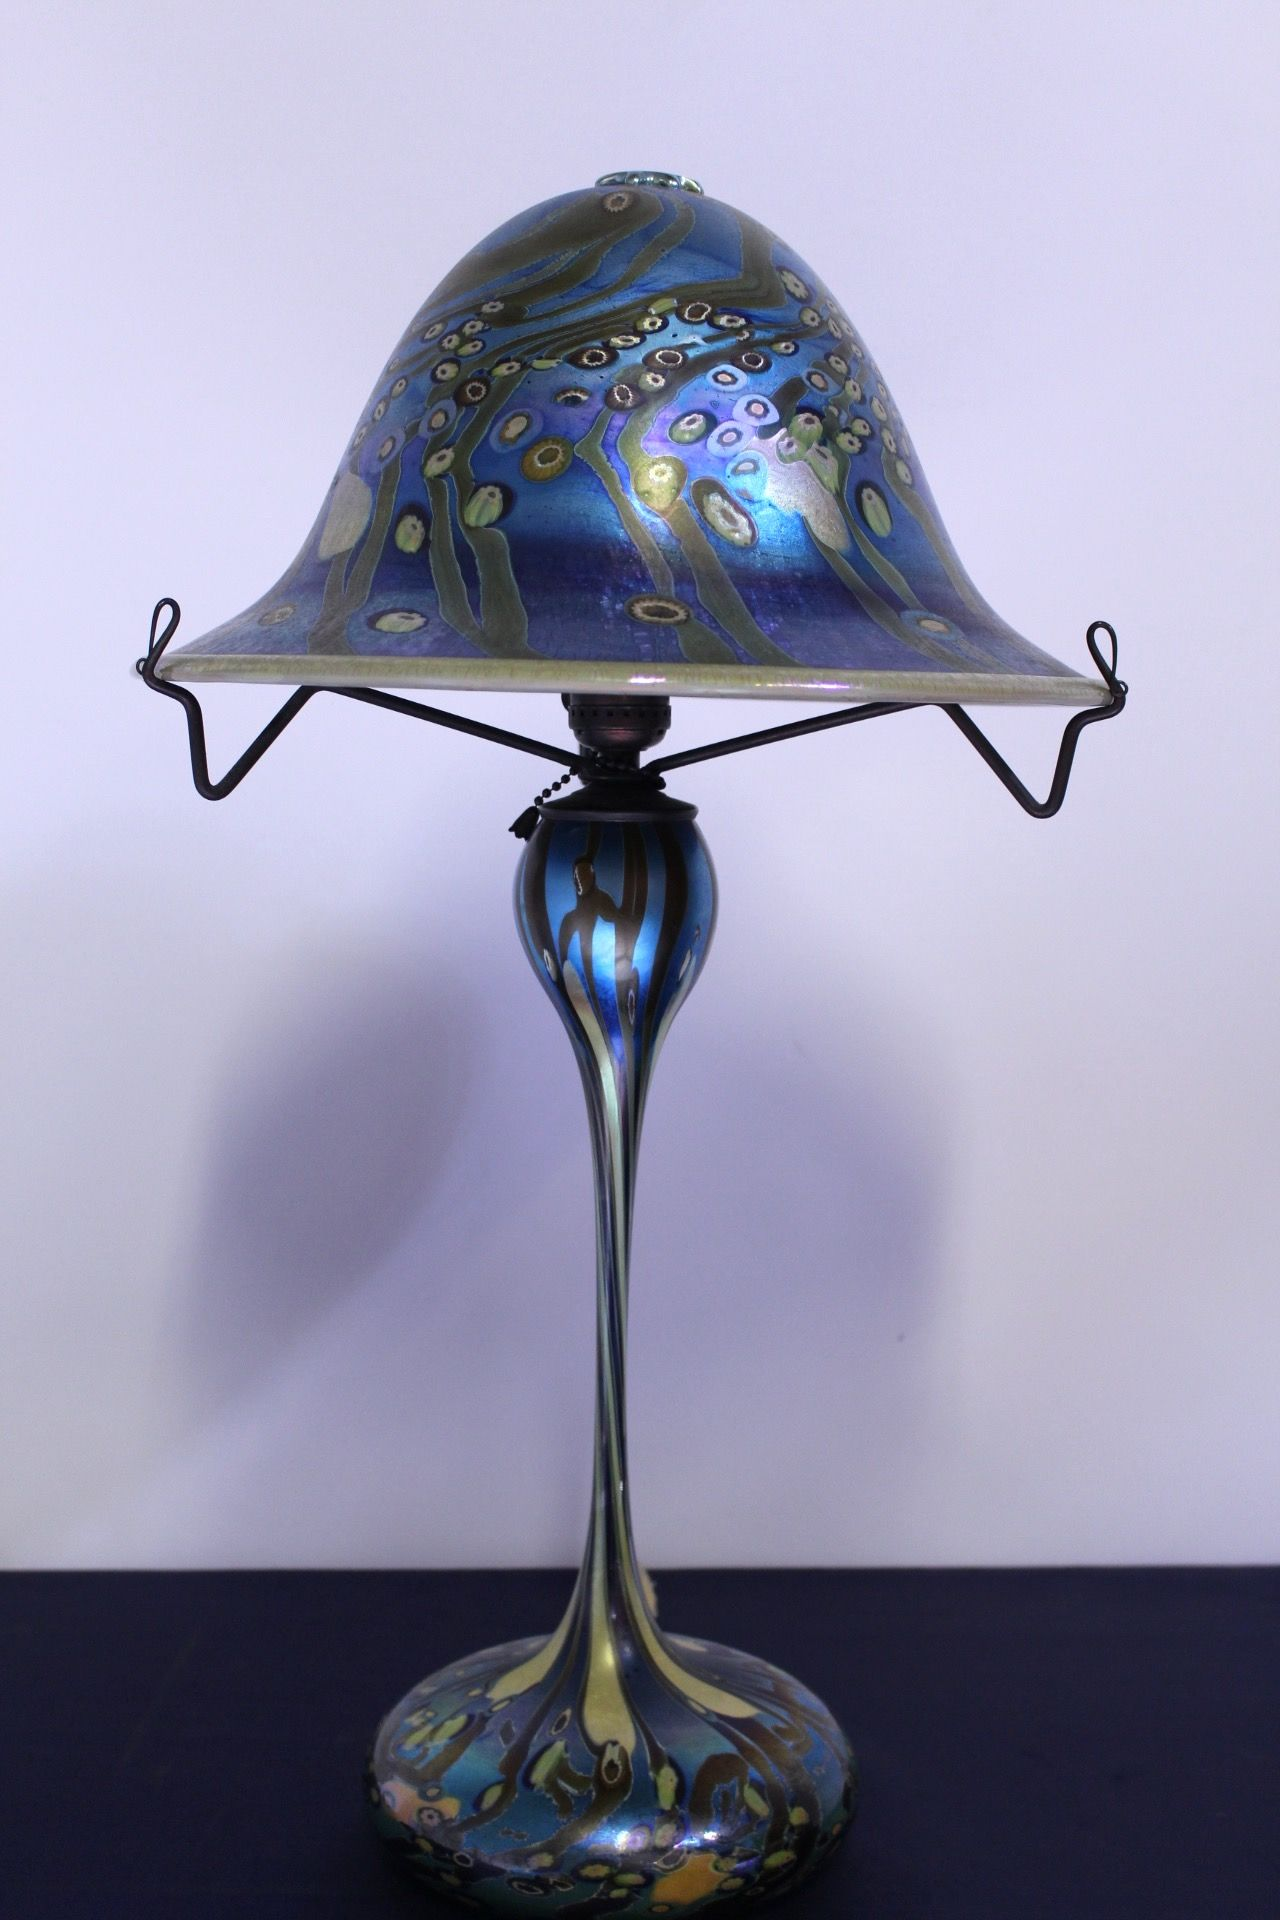 John Cook 1978 Decorative Table Lamp Nov 02, 2019